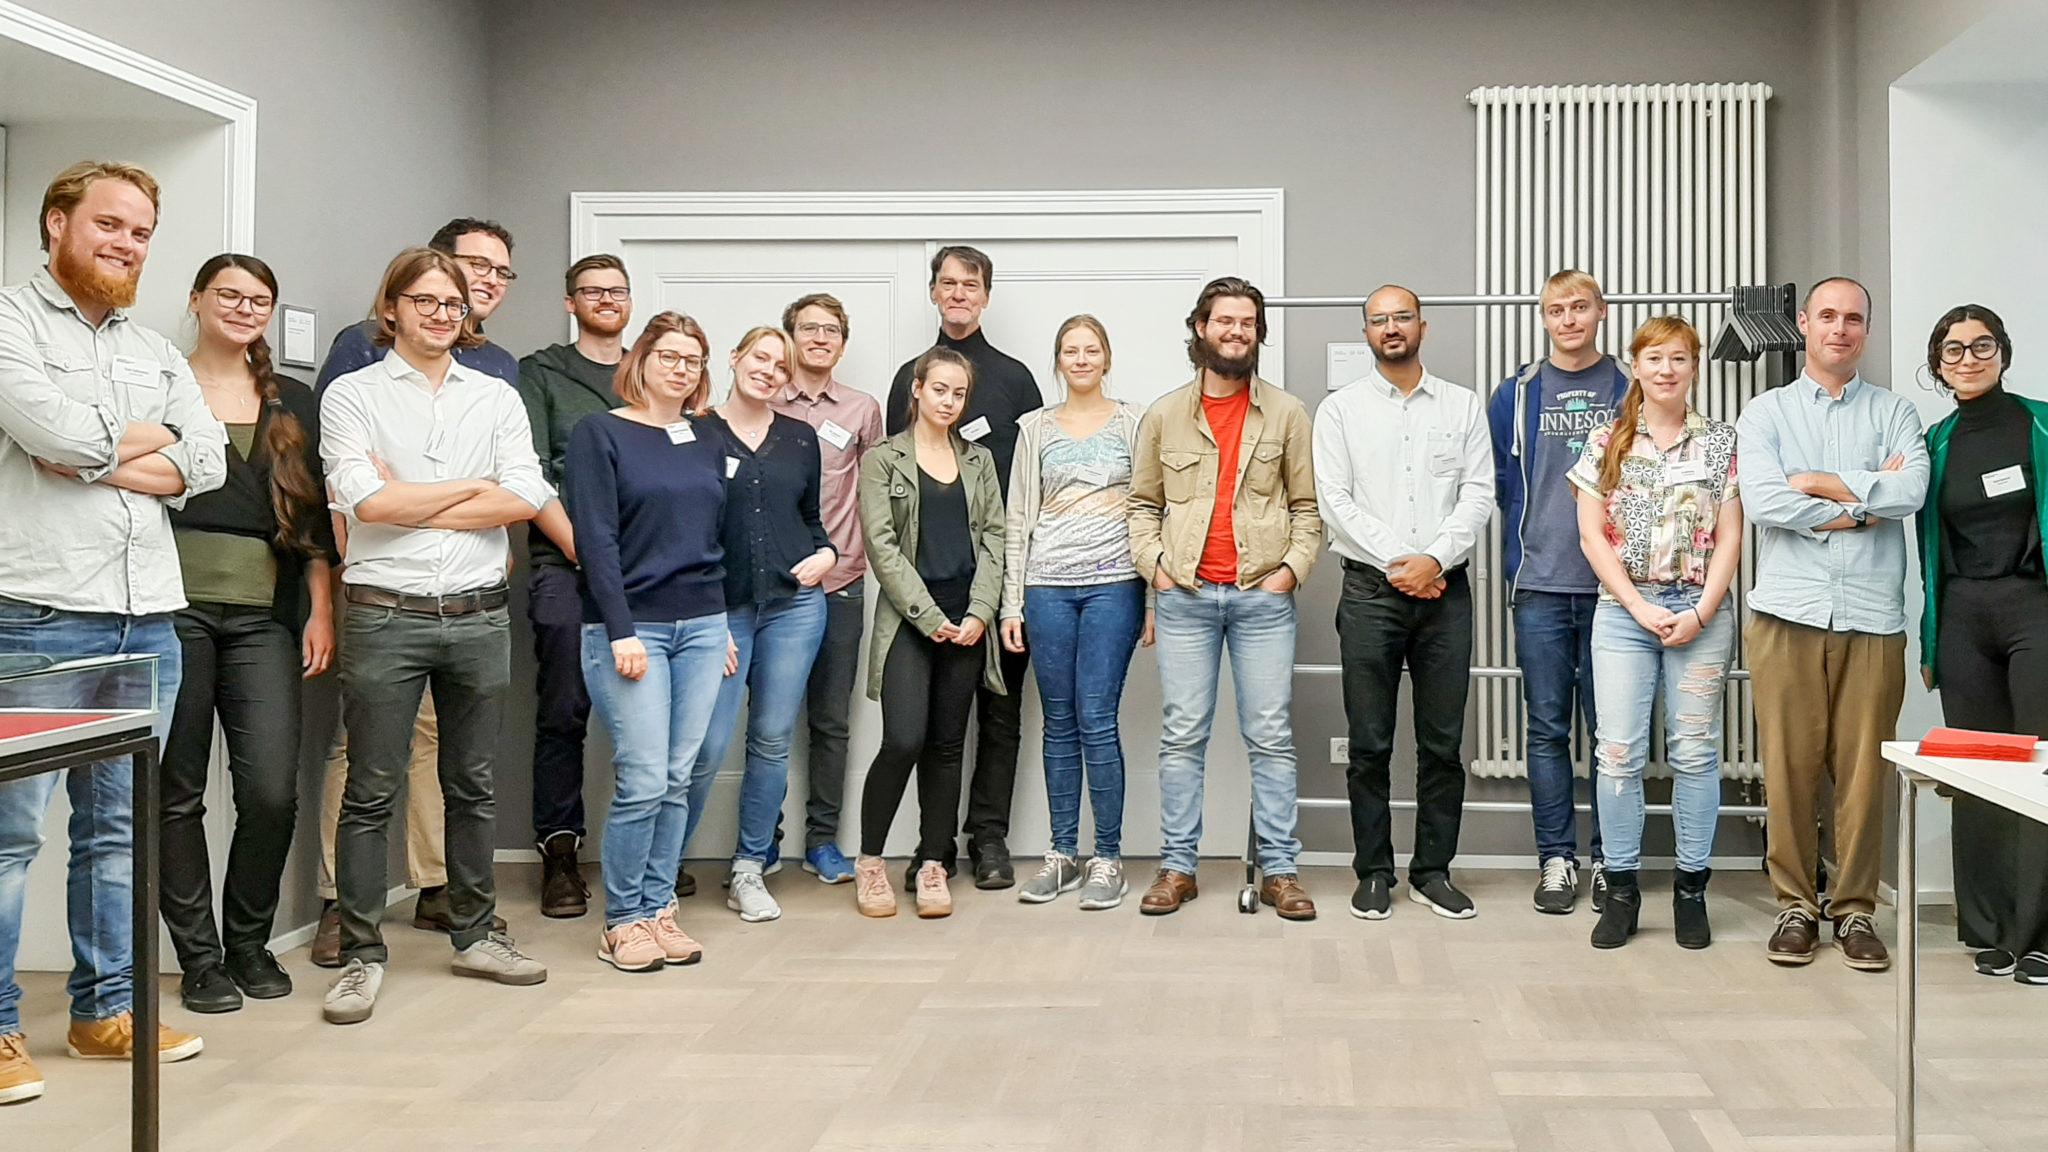 Group photo of the workshop's participants